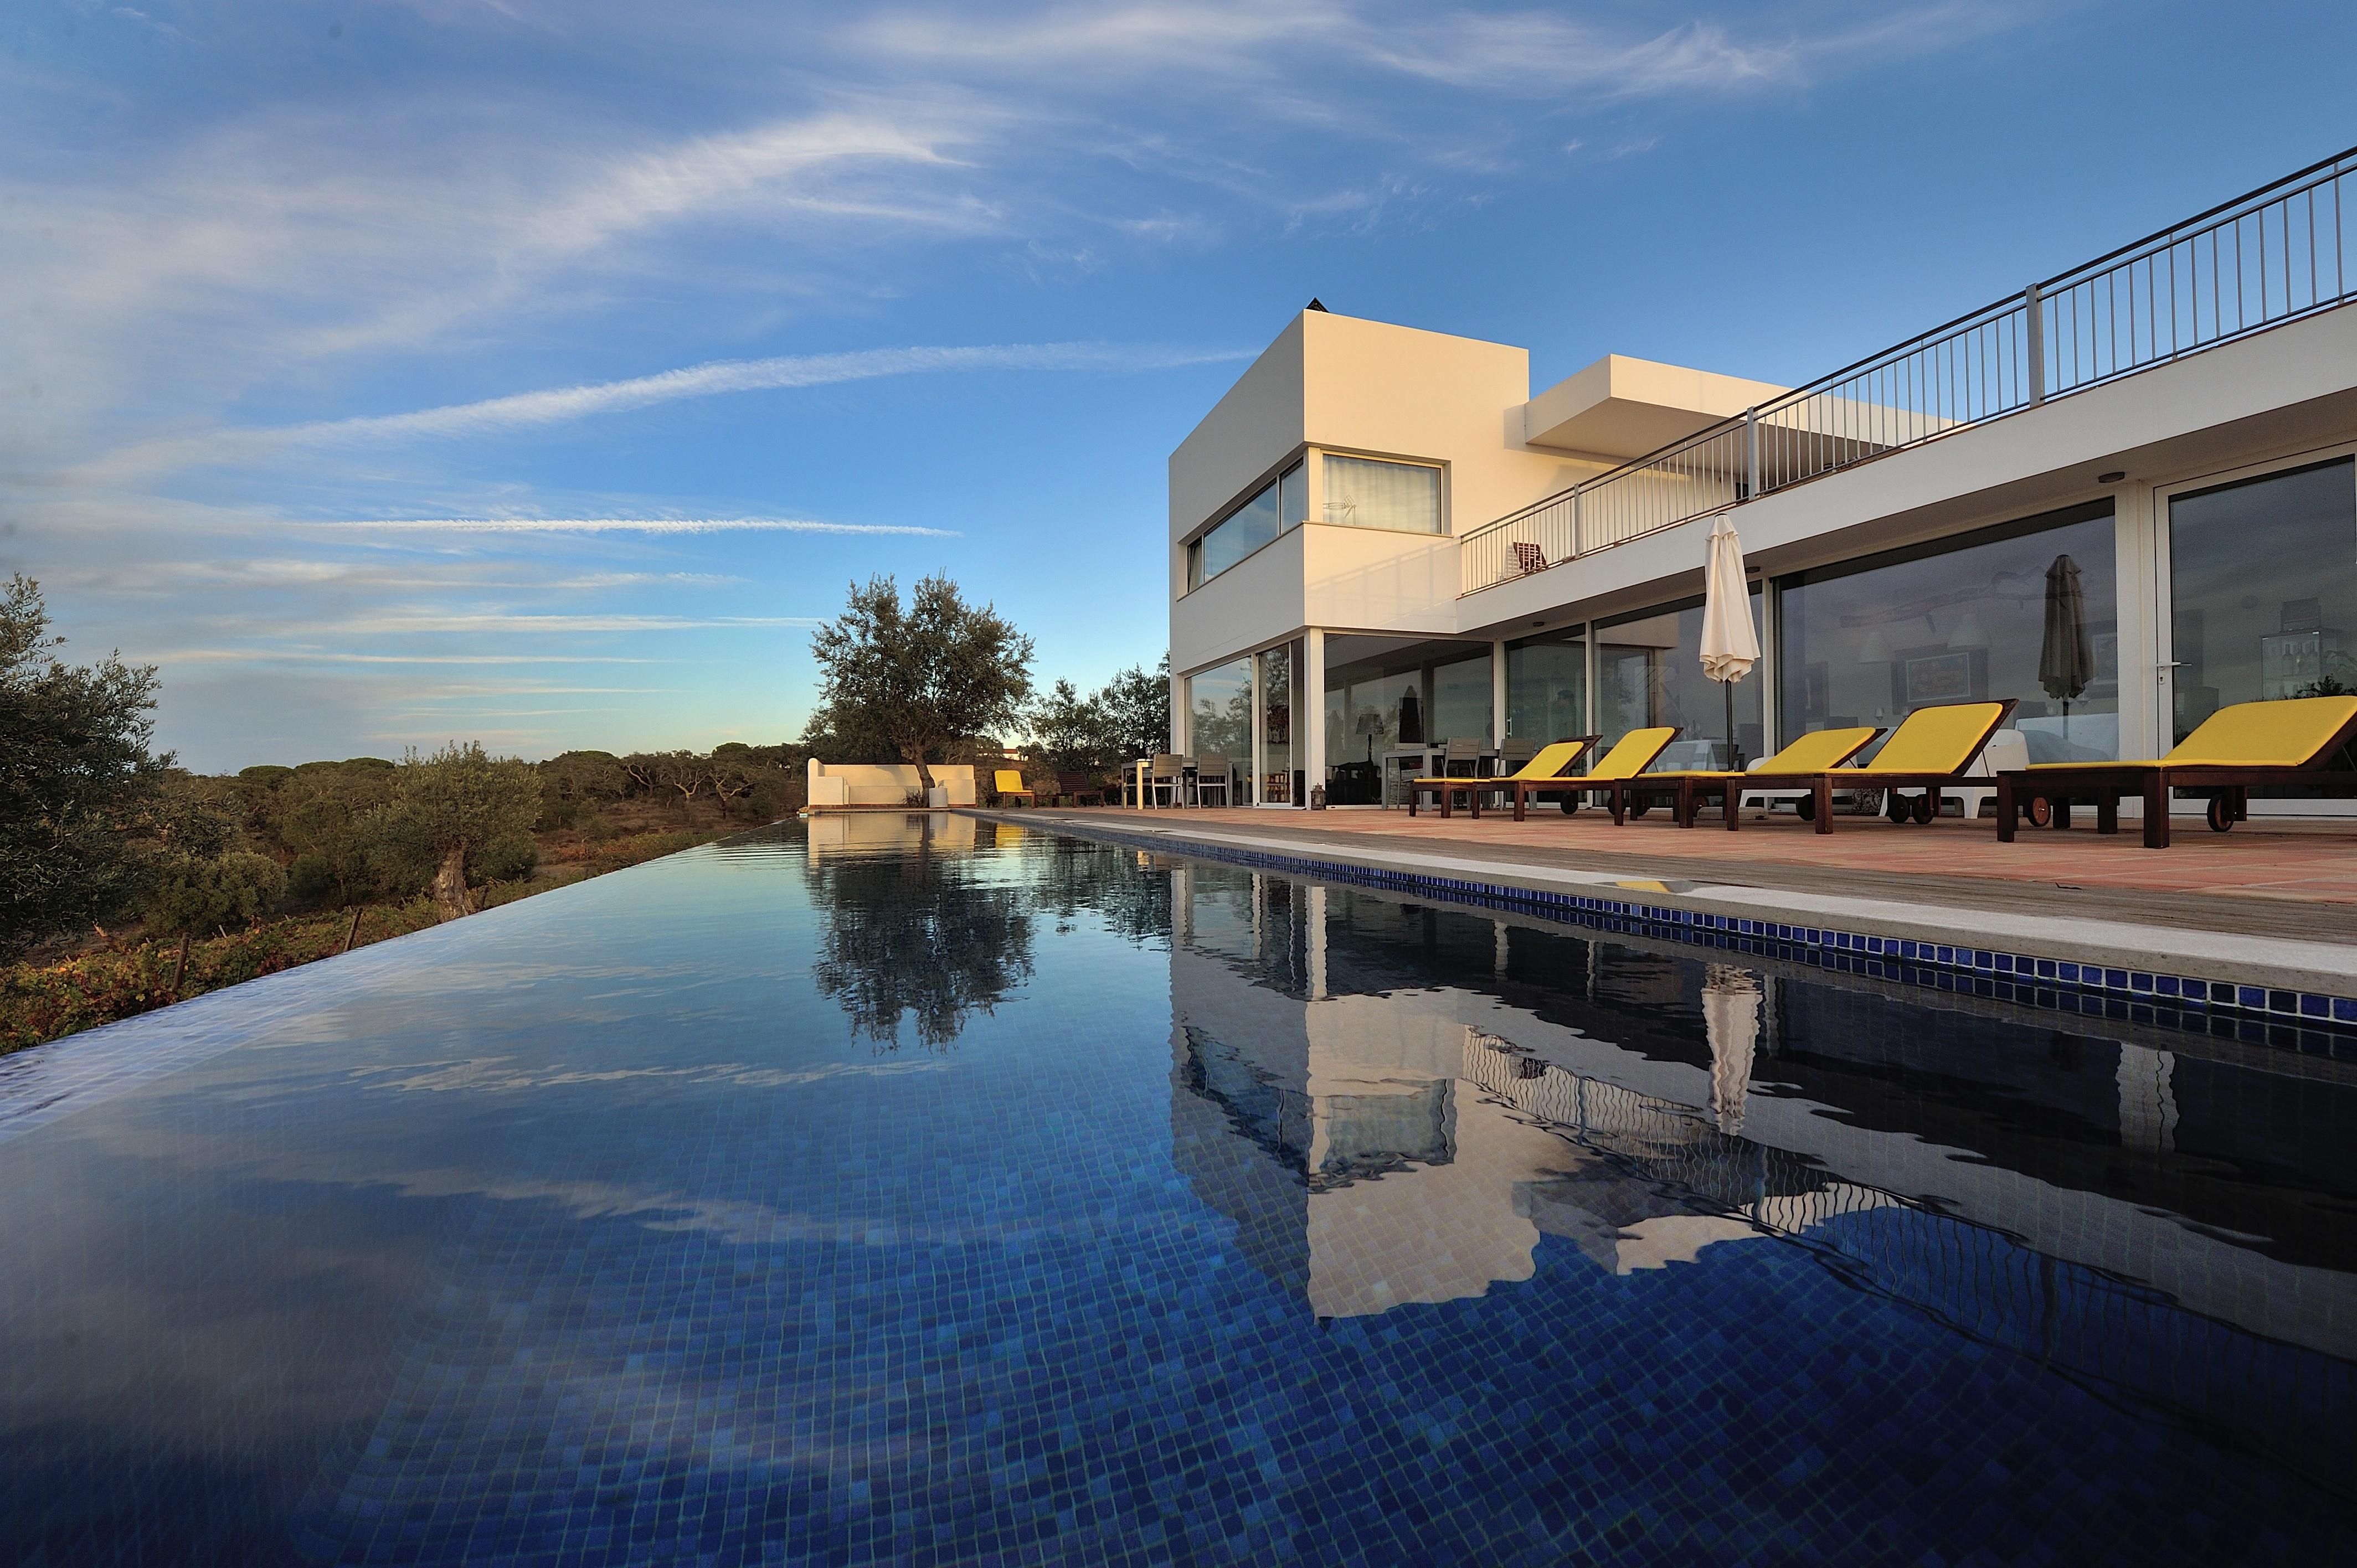 A_Serenada_Enoturismo, best wine hotels in portugal, boutique hotel in alentejo, country hotel in alentejo, serenada enoturismo, portuguese wine regions, península de setúbal, tour in portugal